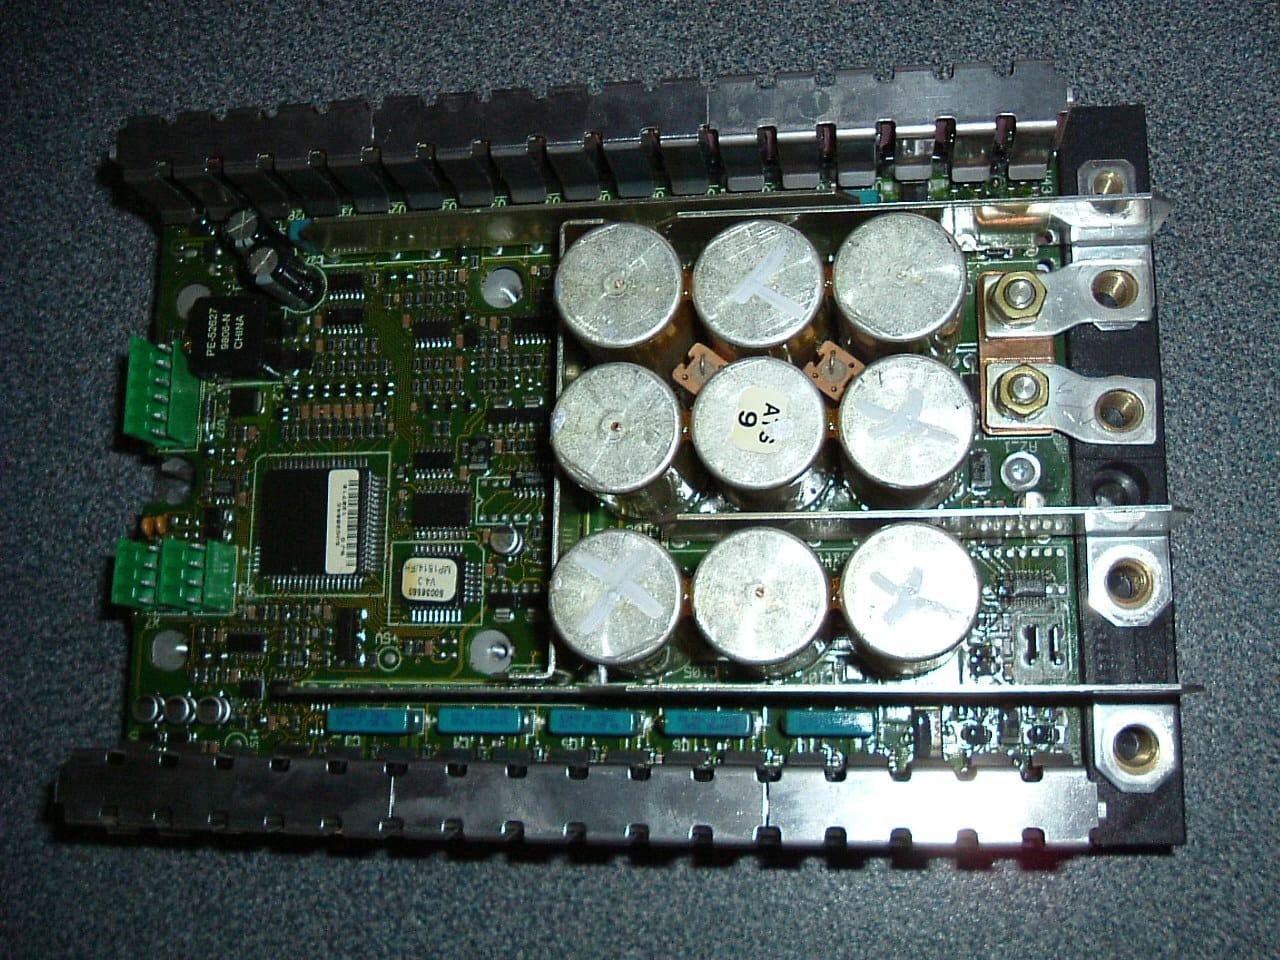 50058837 Jungheinrich MP1514 controller